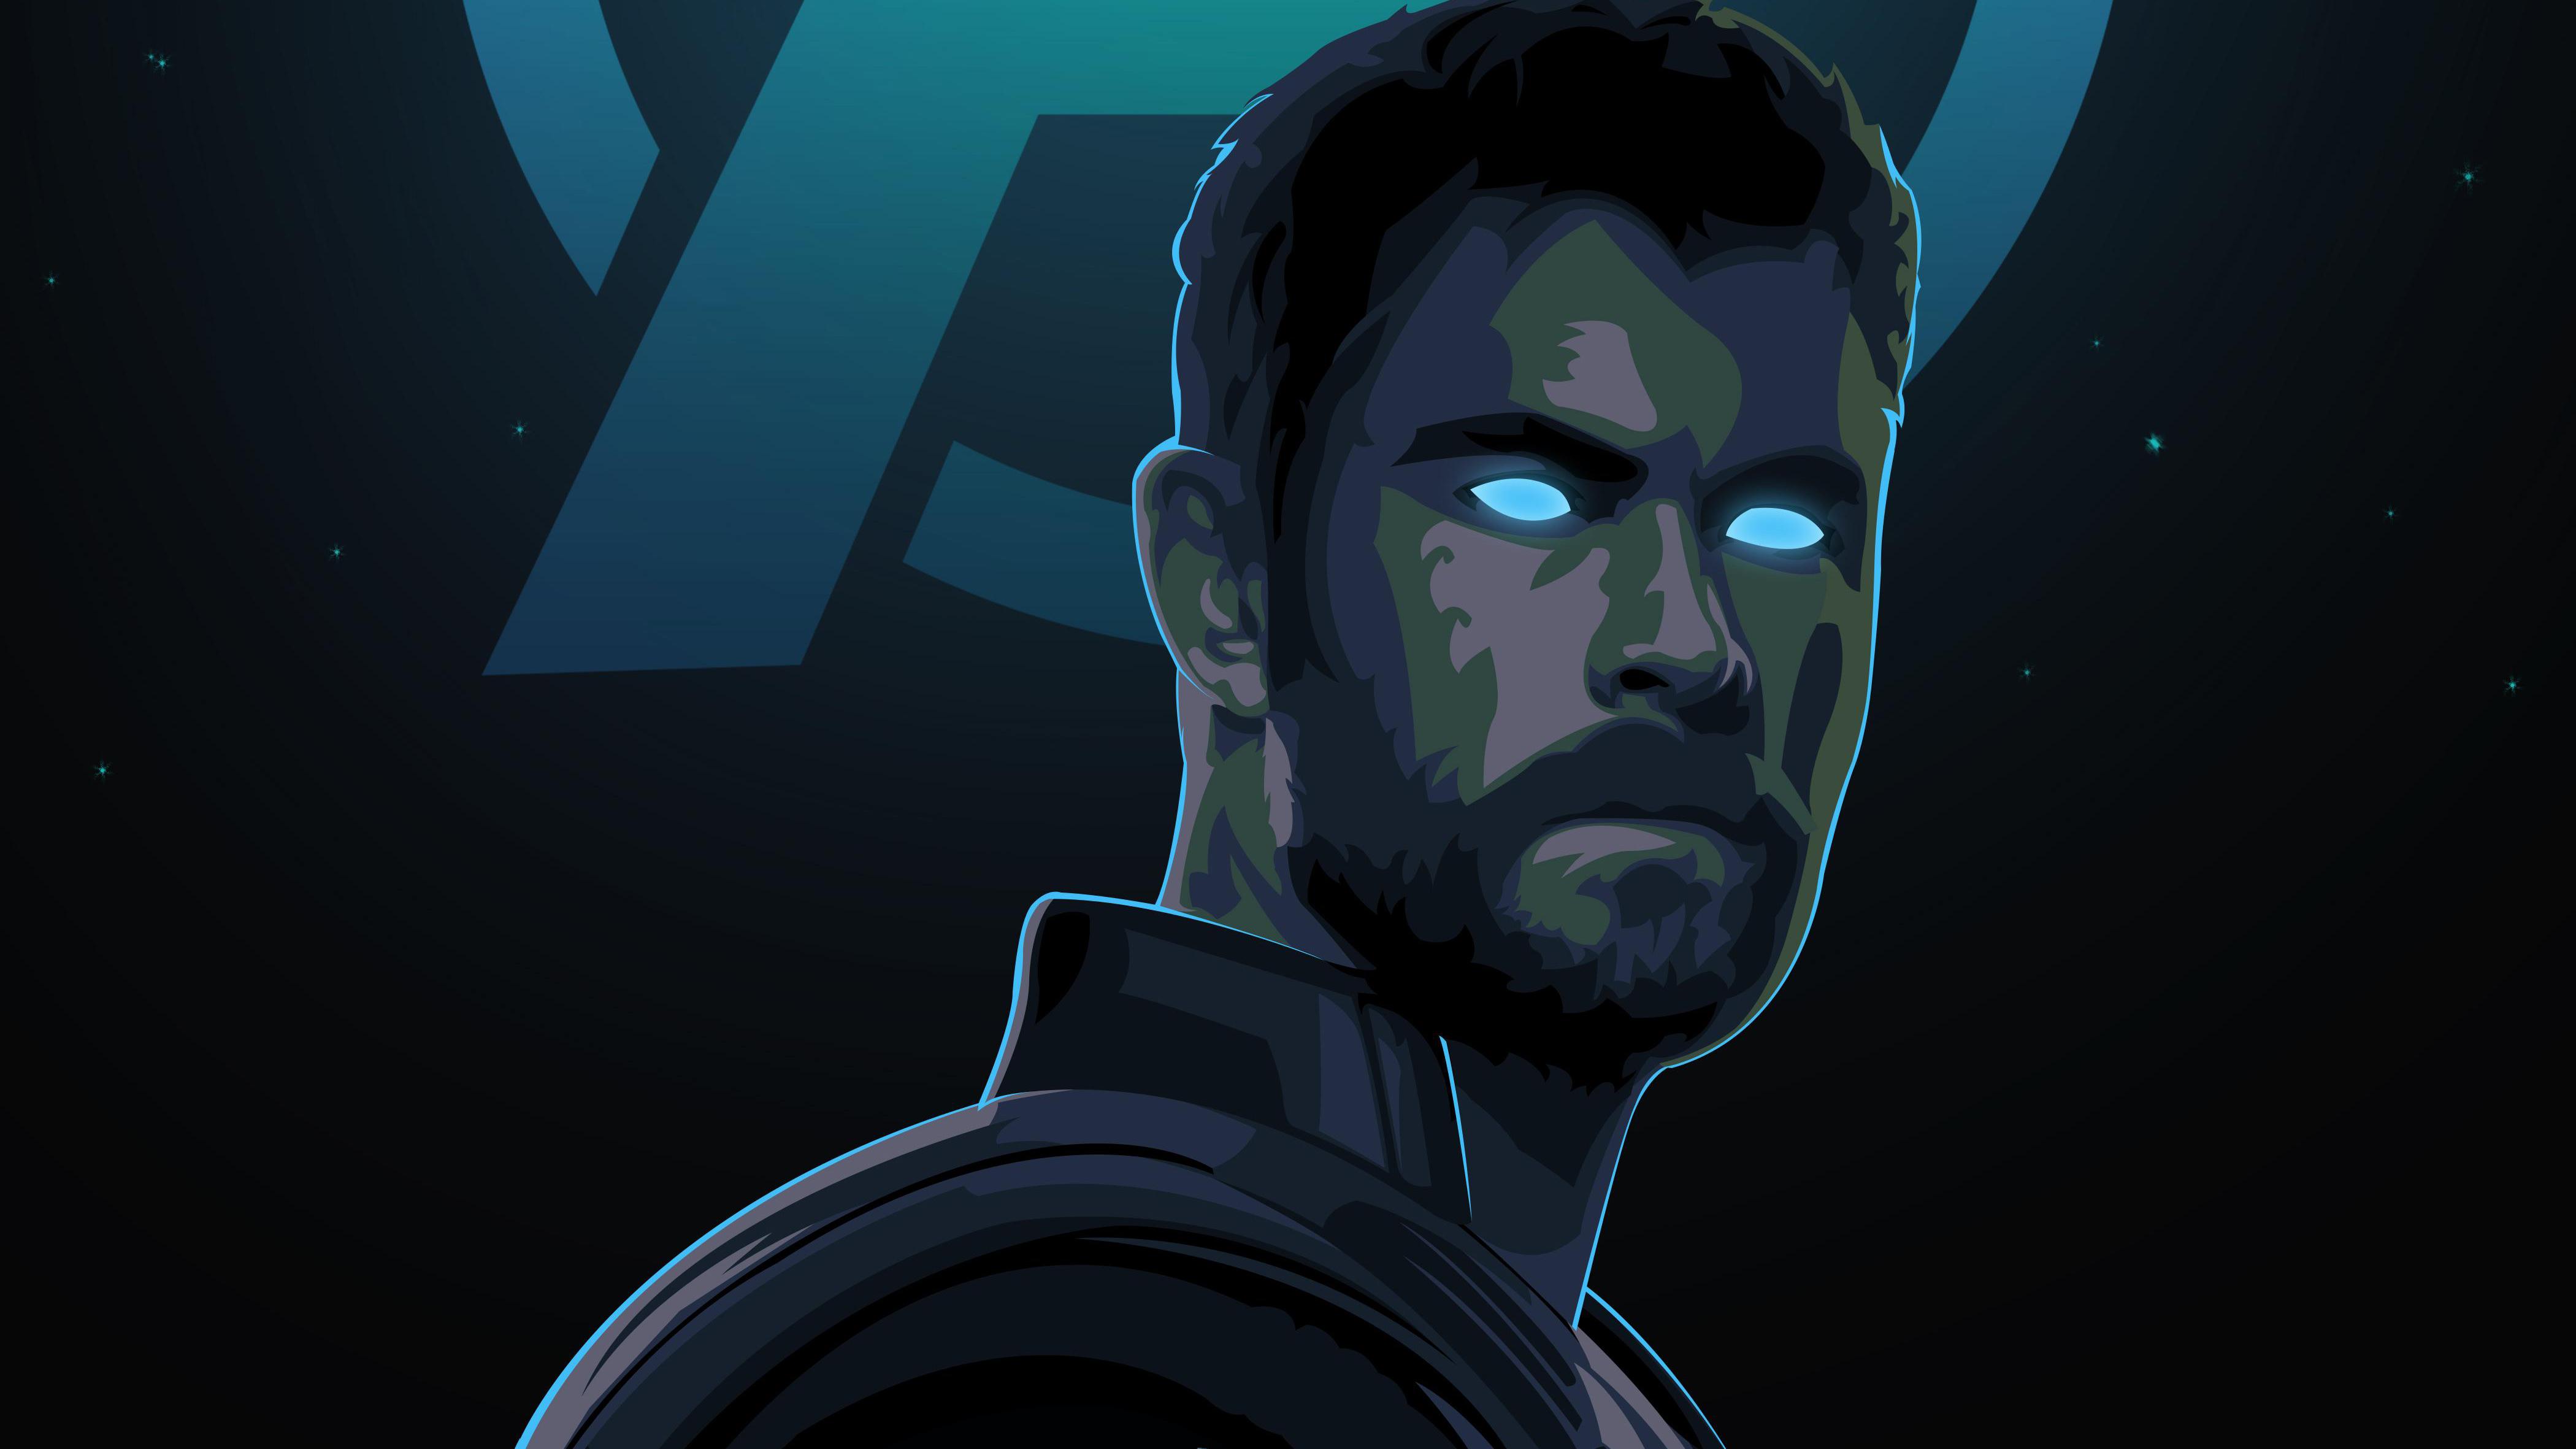 Thor Avengers Endgame 4k, HD Superheroes, 4k Wallpapers ...